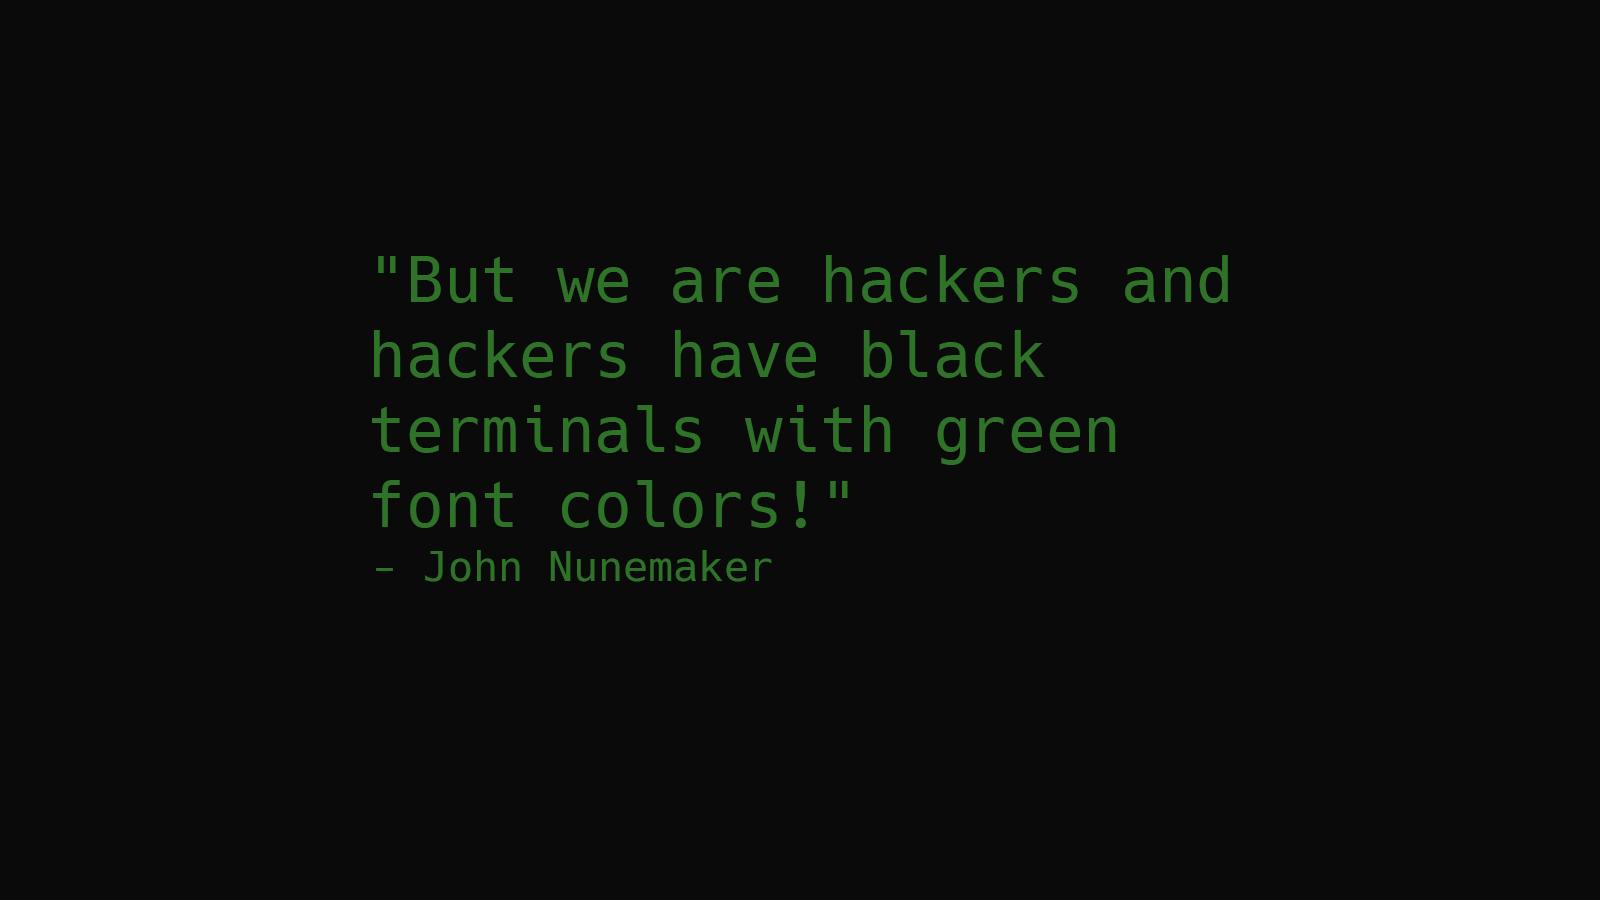 General 1600x900 terminals hackers hackerman green minimalism text humor quote